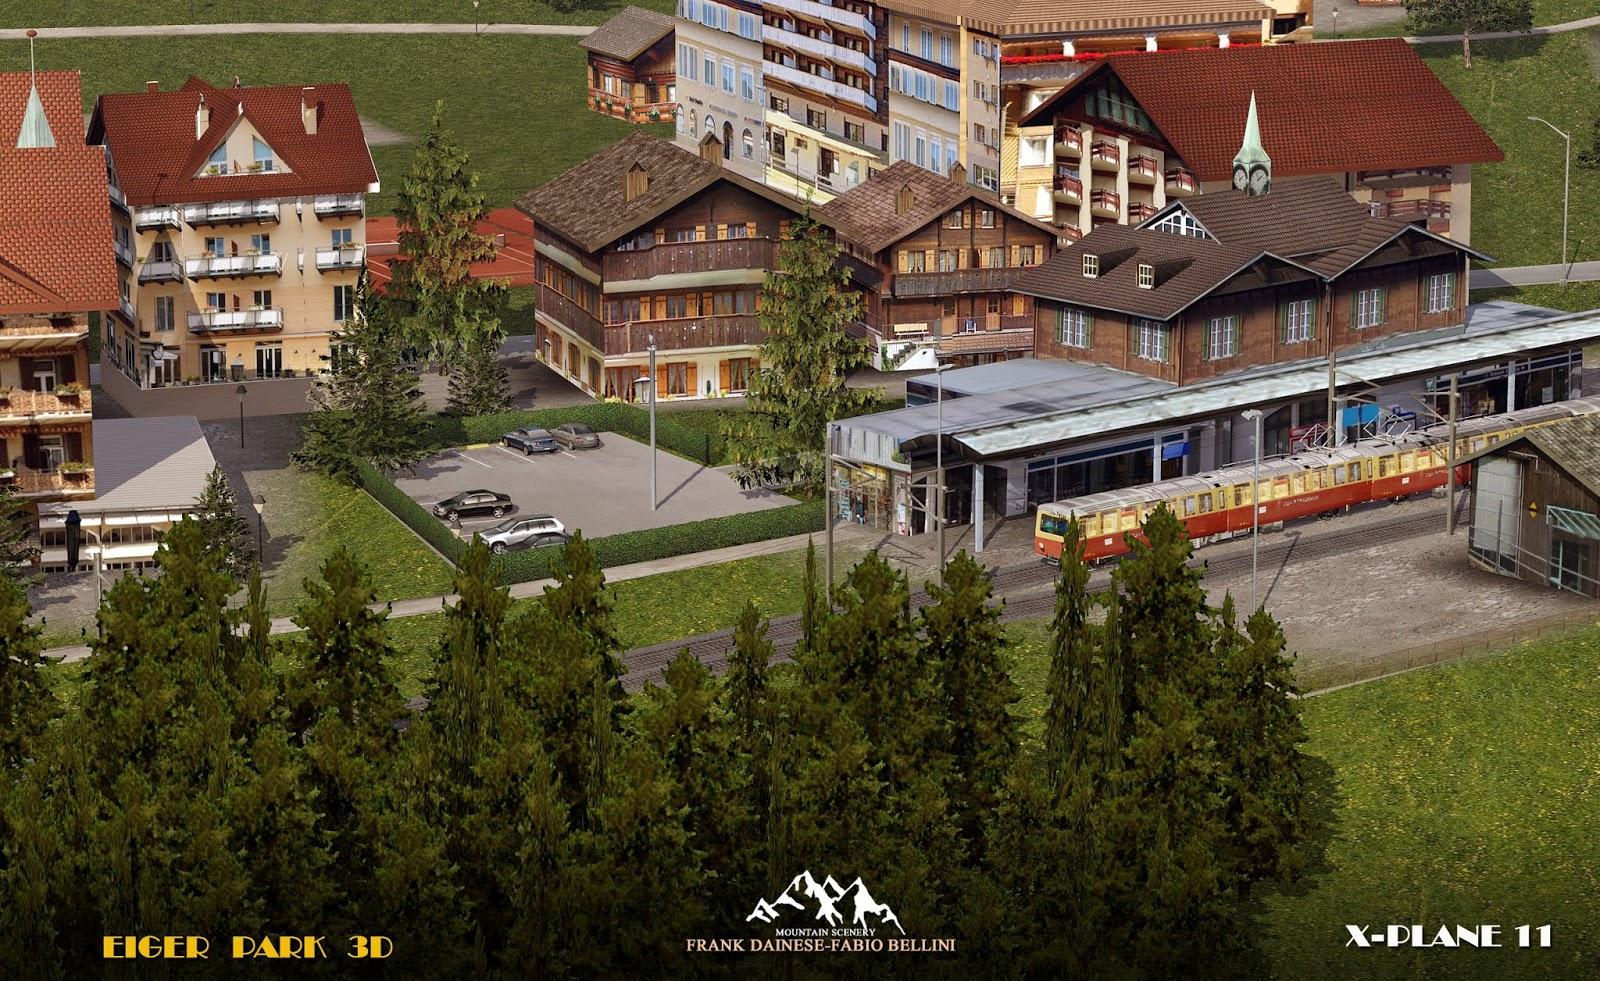 x-plane] Frank Dainese/Fabio Bellini Eiger Park 3D Release